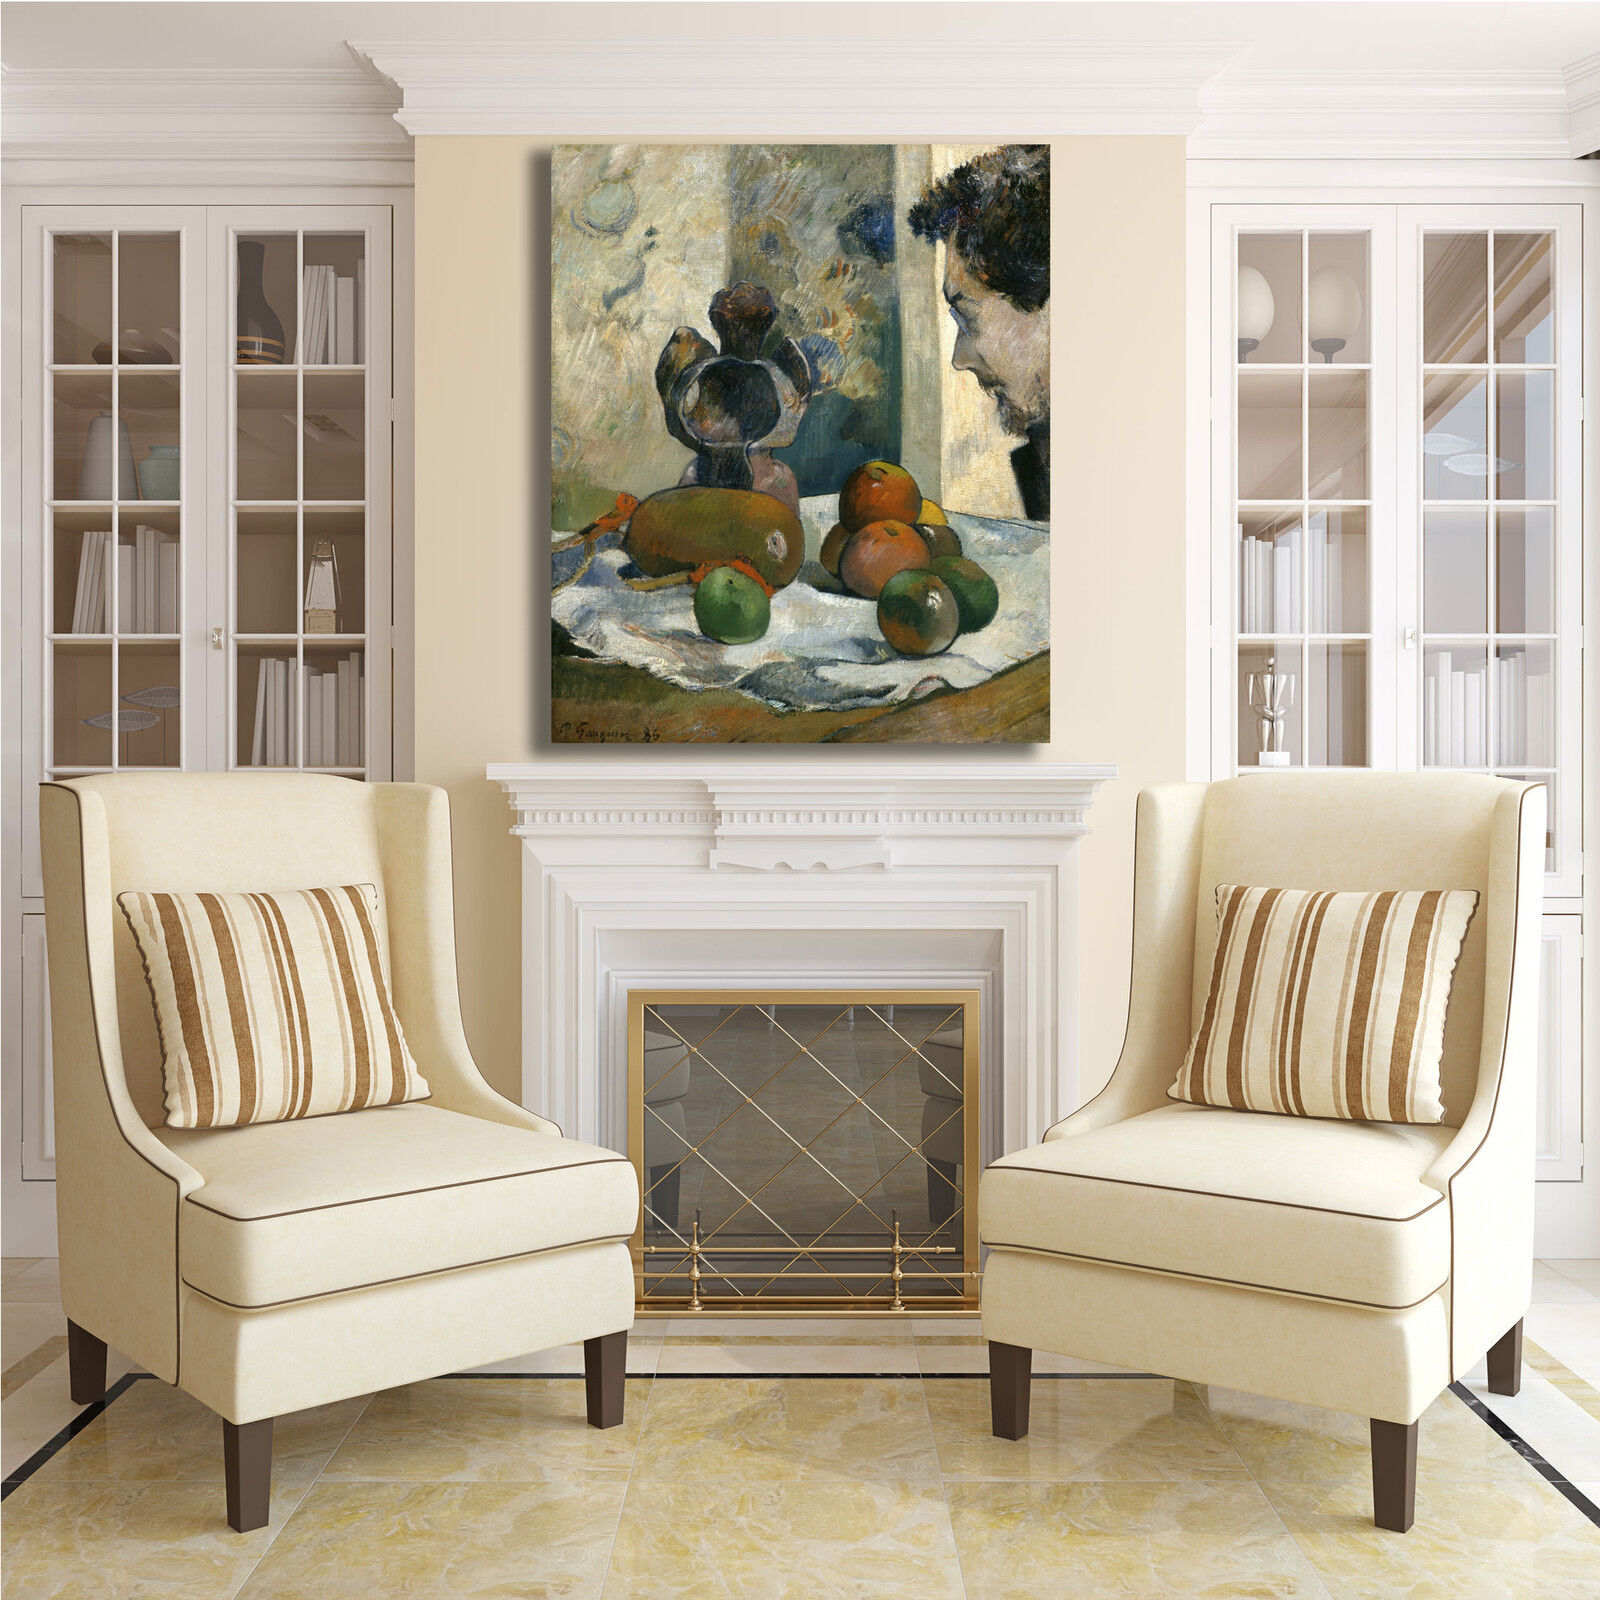 Gauguin natura morta con laval quadro stampa tela dipinto telaio arRouge arRouge telaio o casa c61980